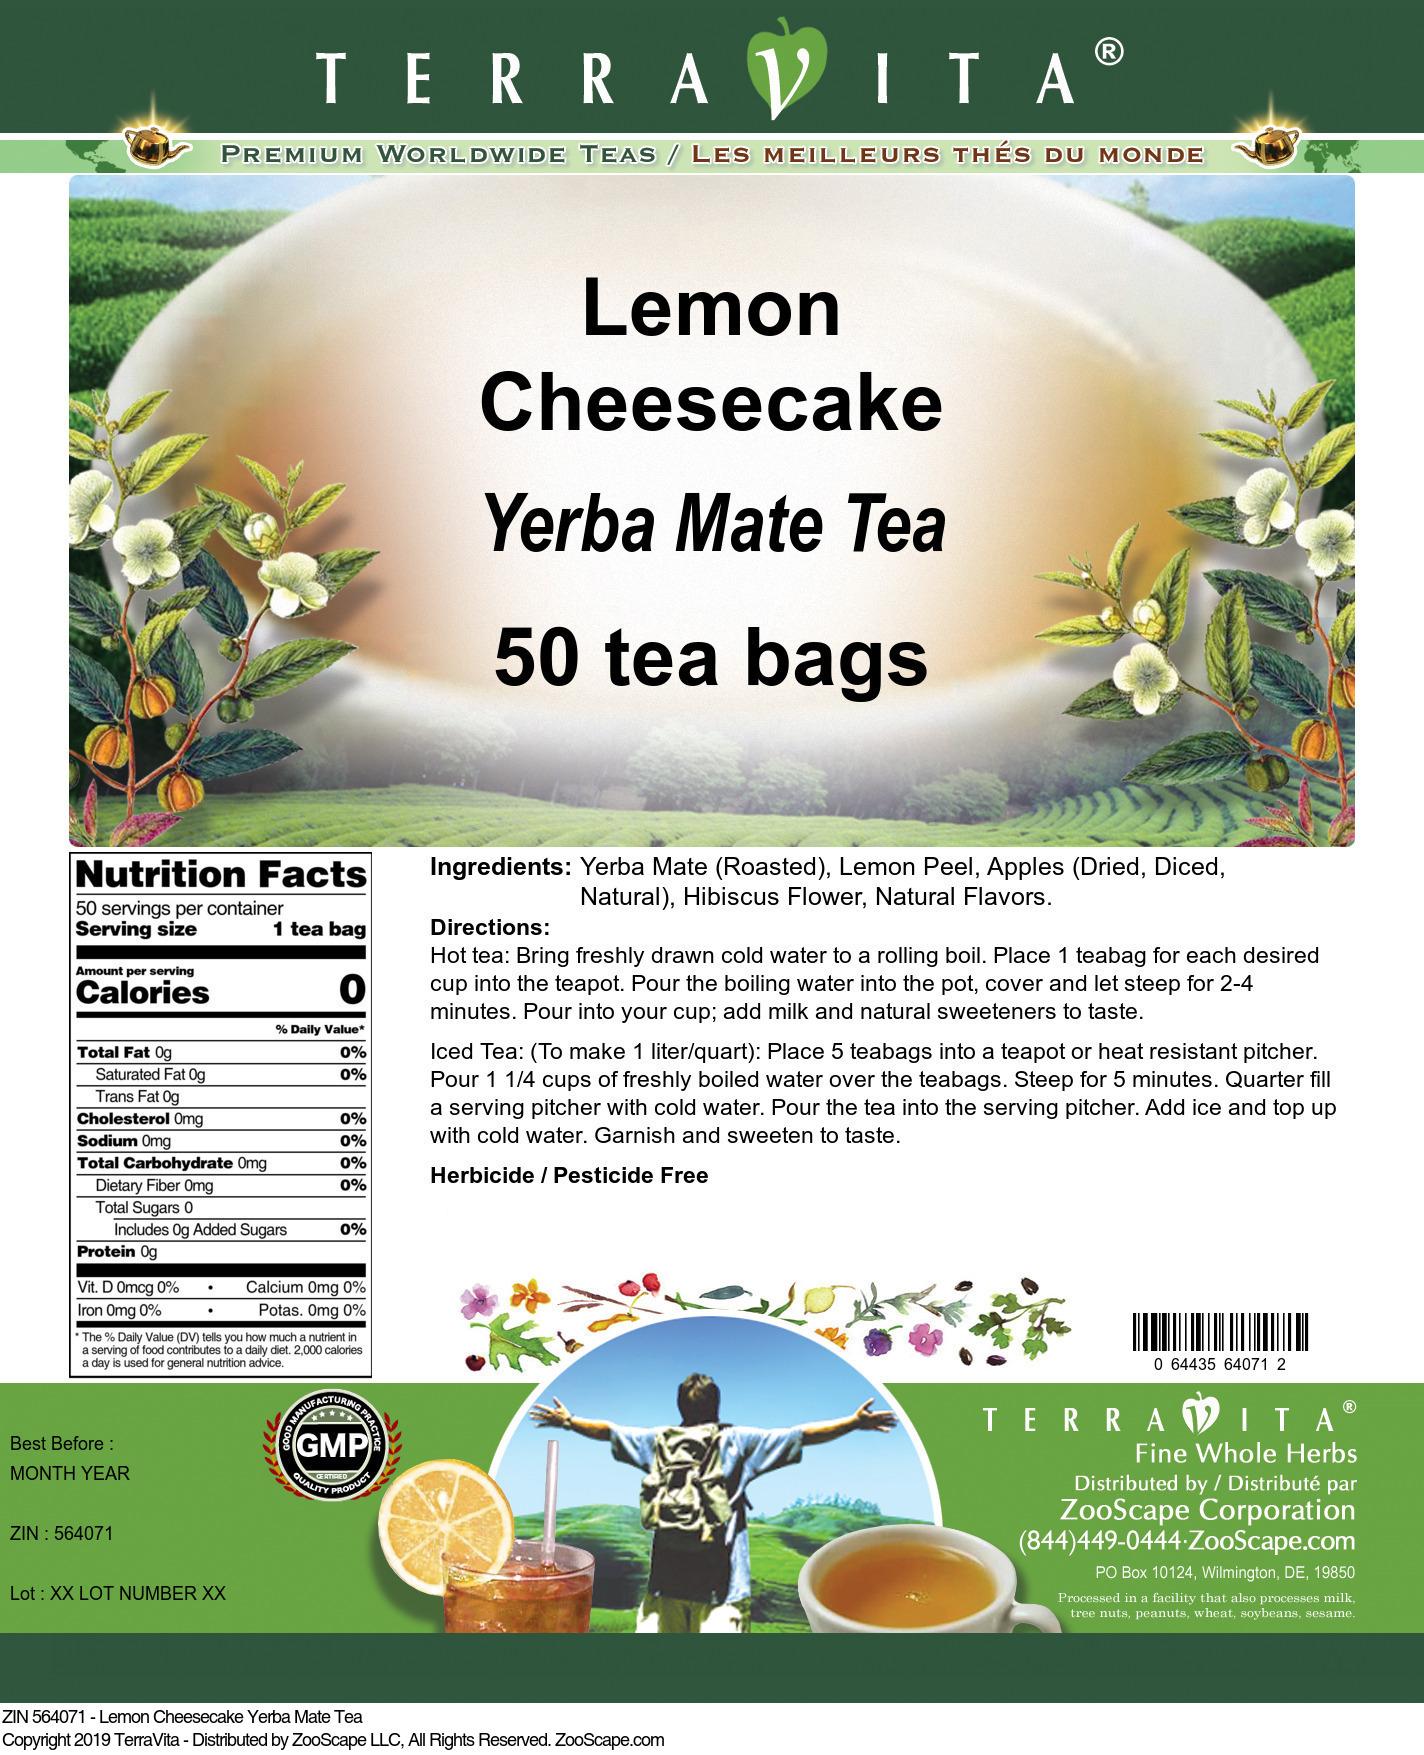 Lemon Cheesecake Yerba Mate Tea